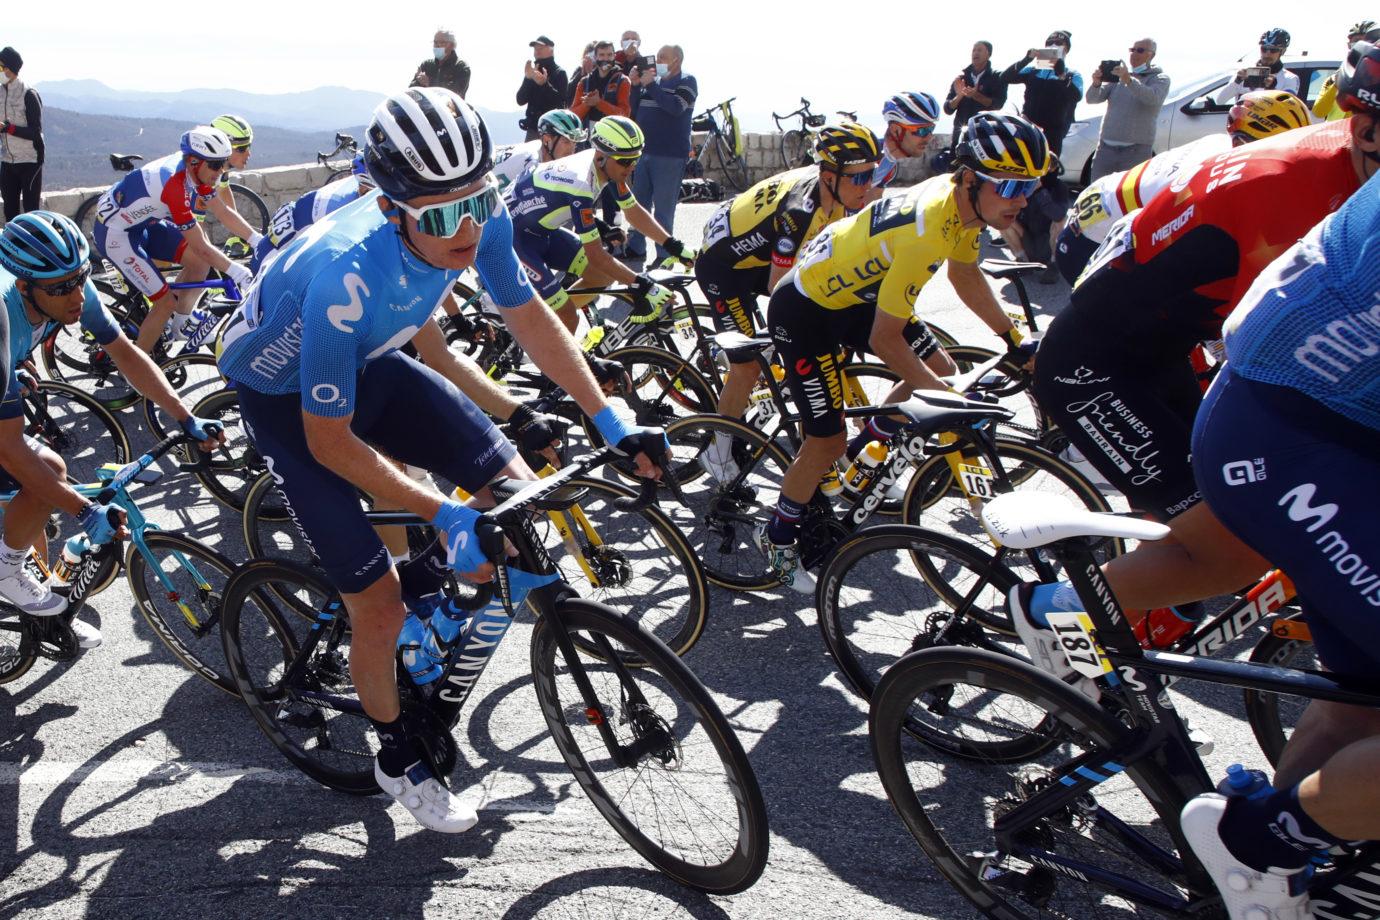 Imagen de la noticia 'Jorgenson 5th overall before decisive weekend'